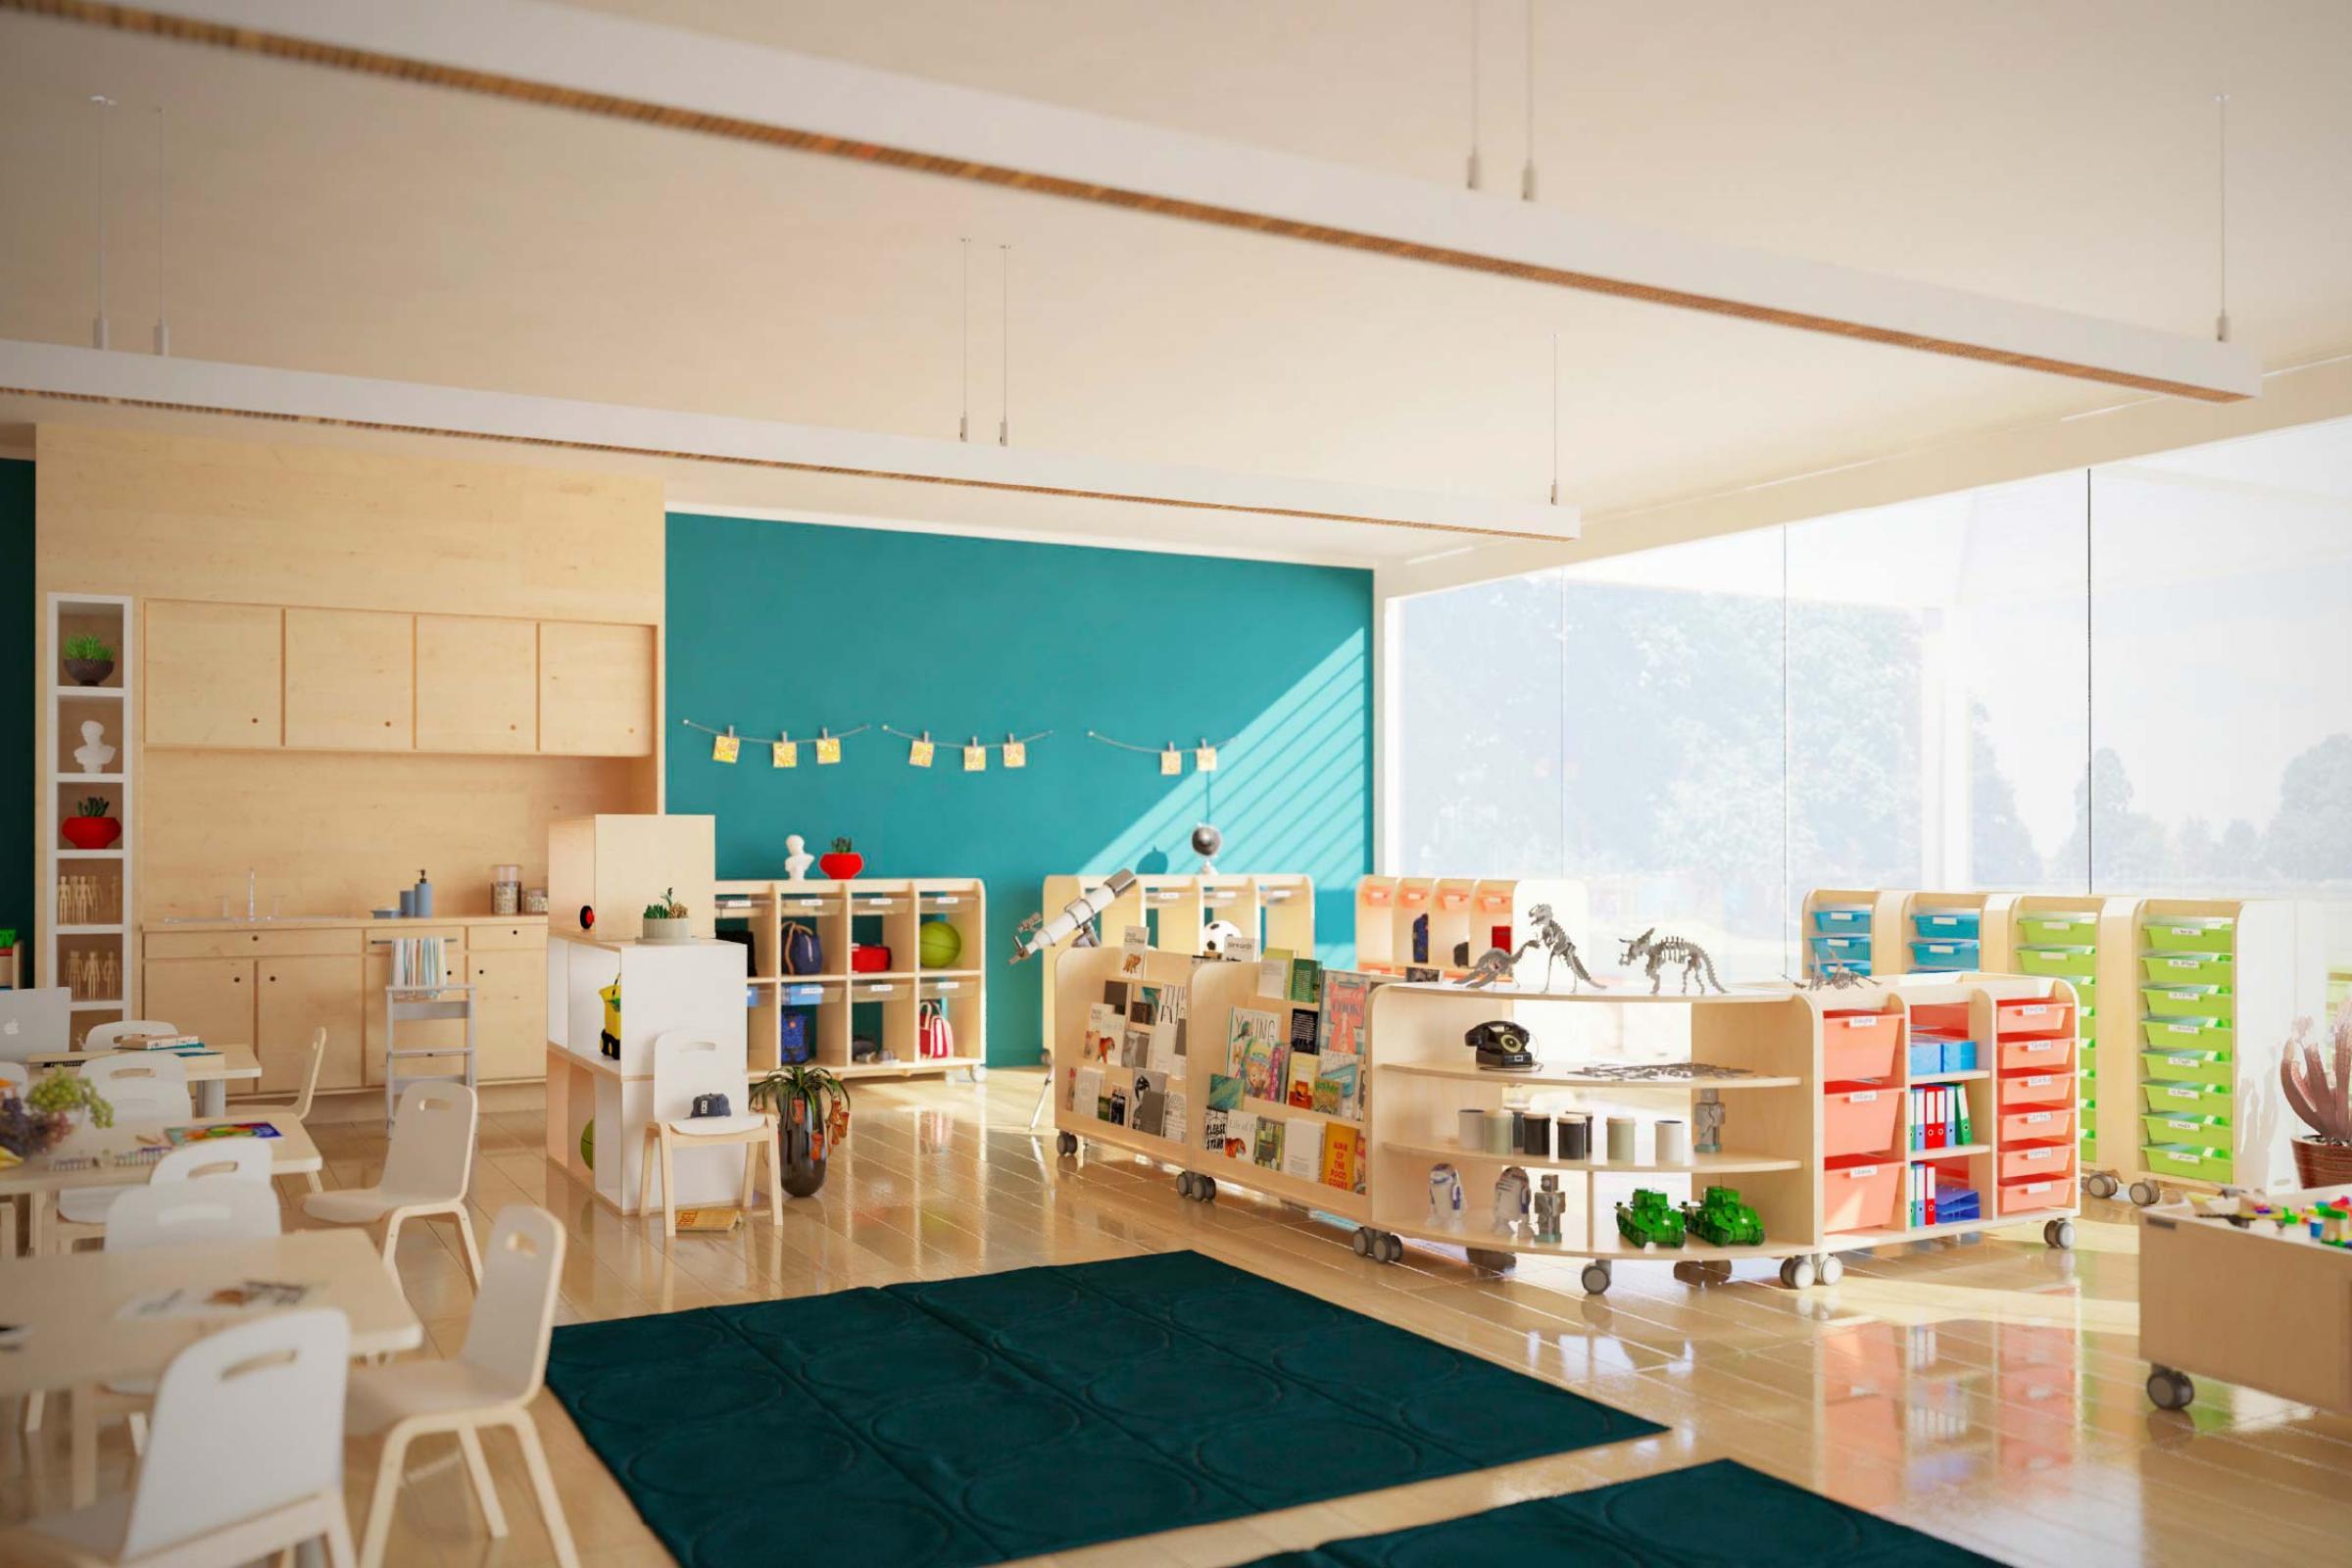 Primary-School-ILE-room-plan-feature.jpg